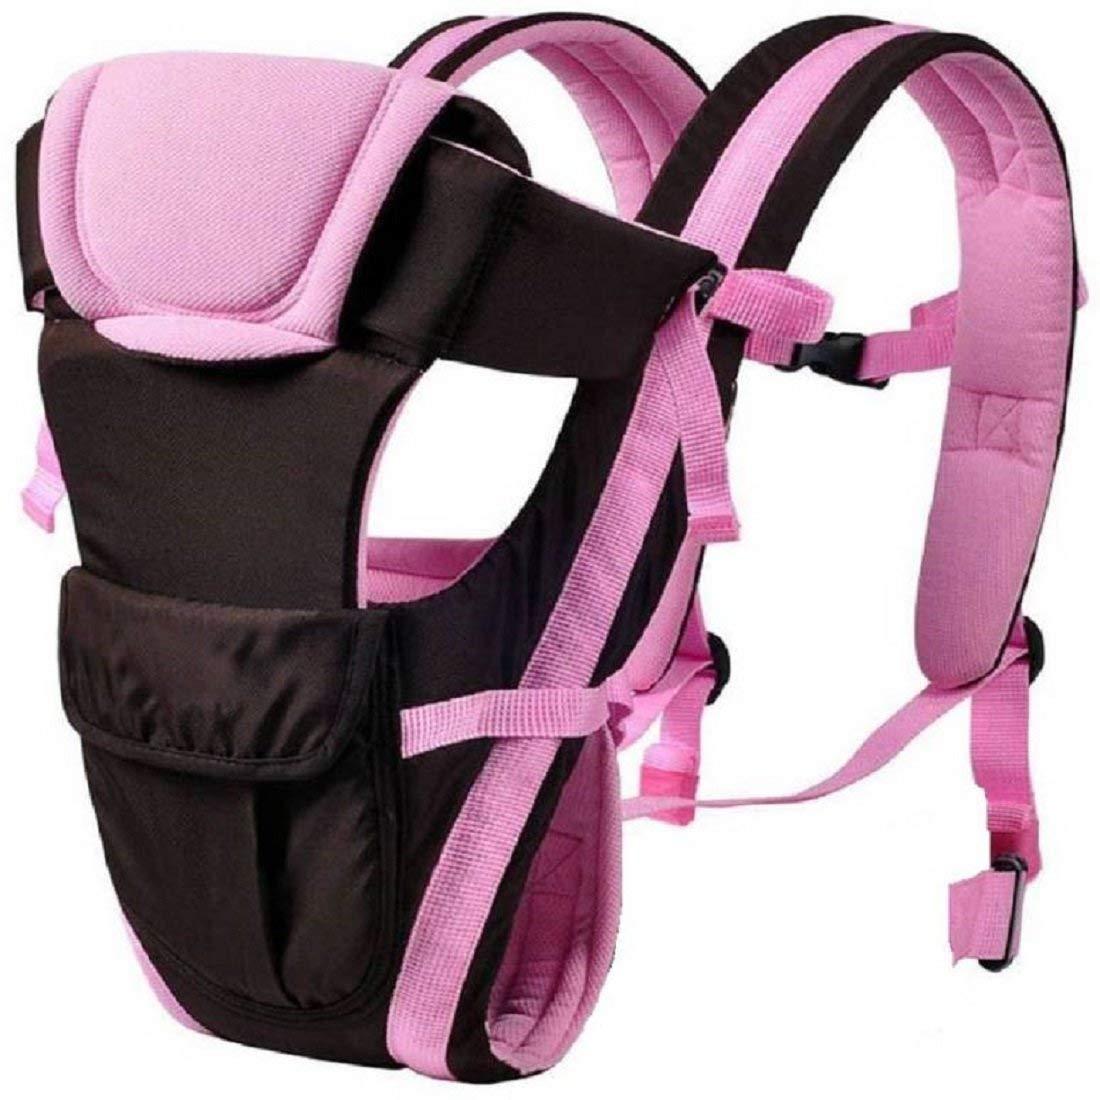 Adjustable Newborn Infant Baby Carrier 3D Breathable Wrap Rider Sling Backpack